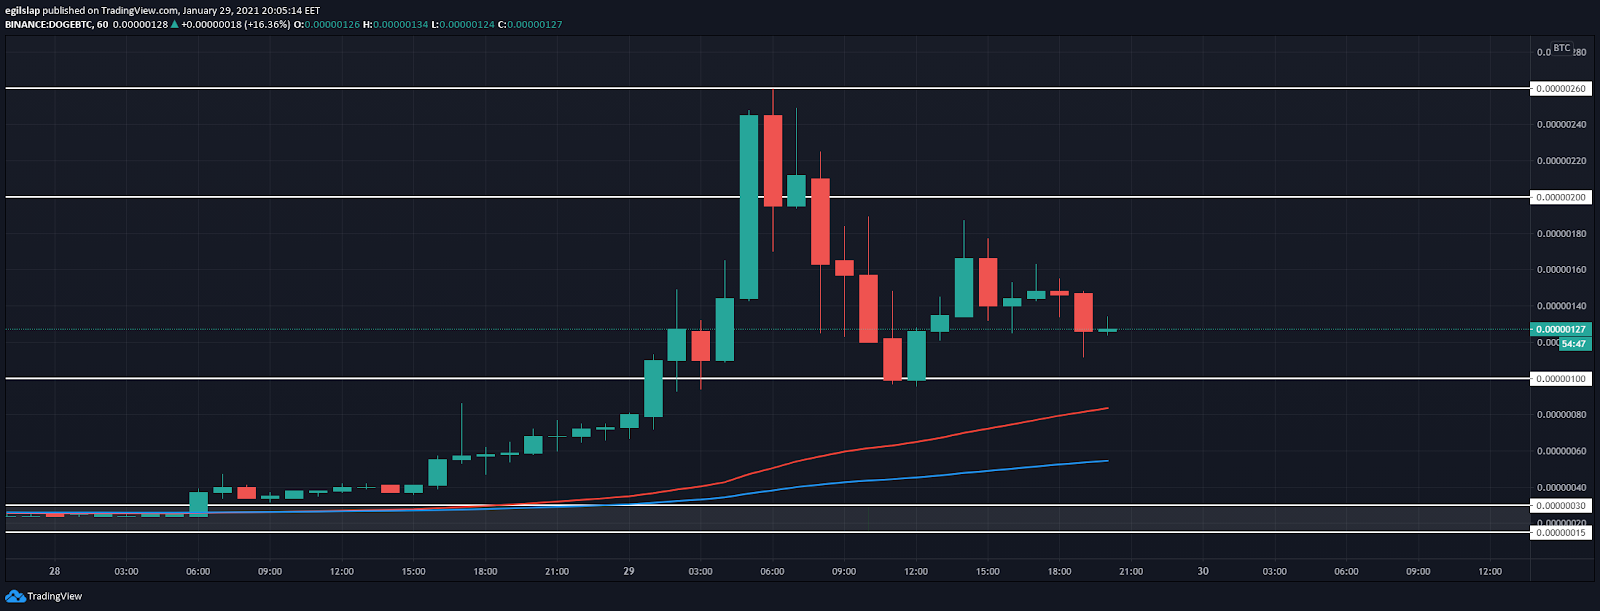 Dogecoin price prediction 2021: DOGE skyrockets to 200 Satoshi in a historical bullish move 2